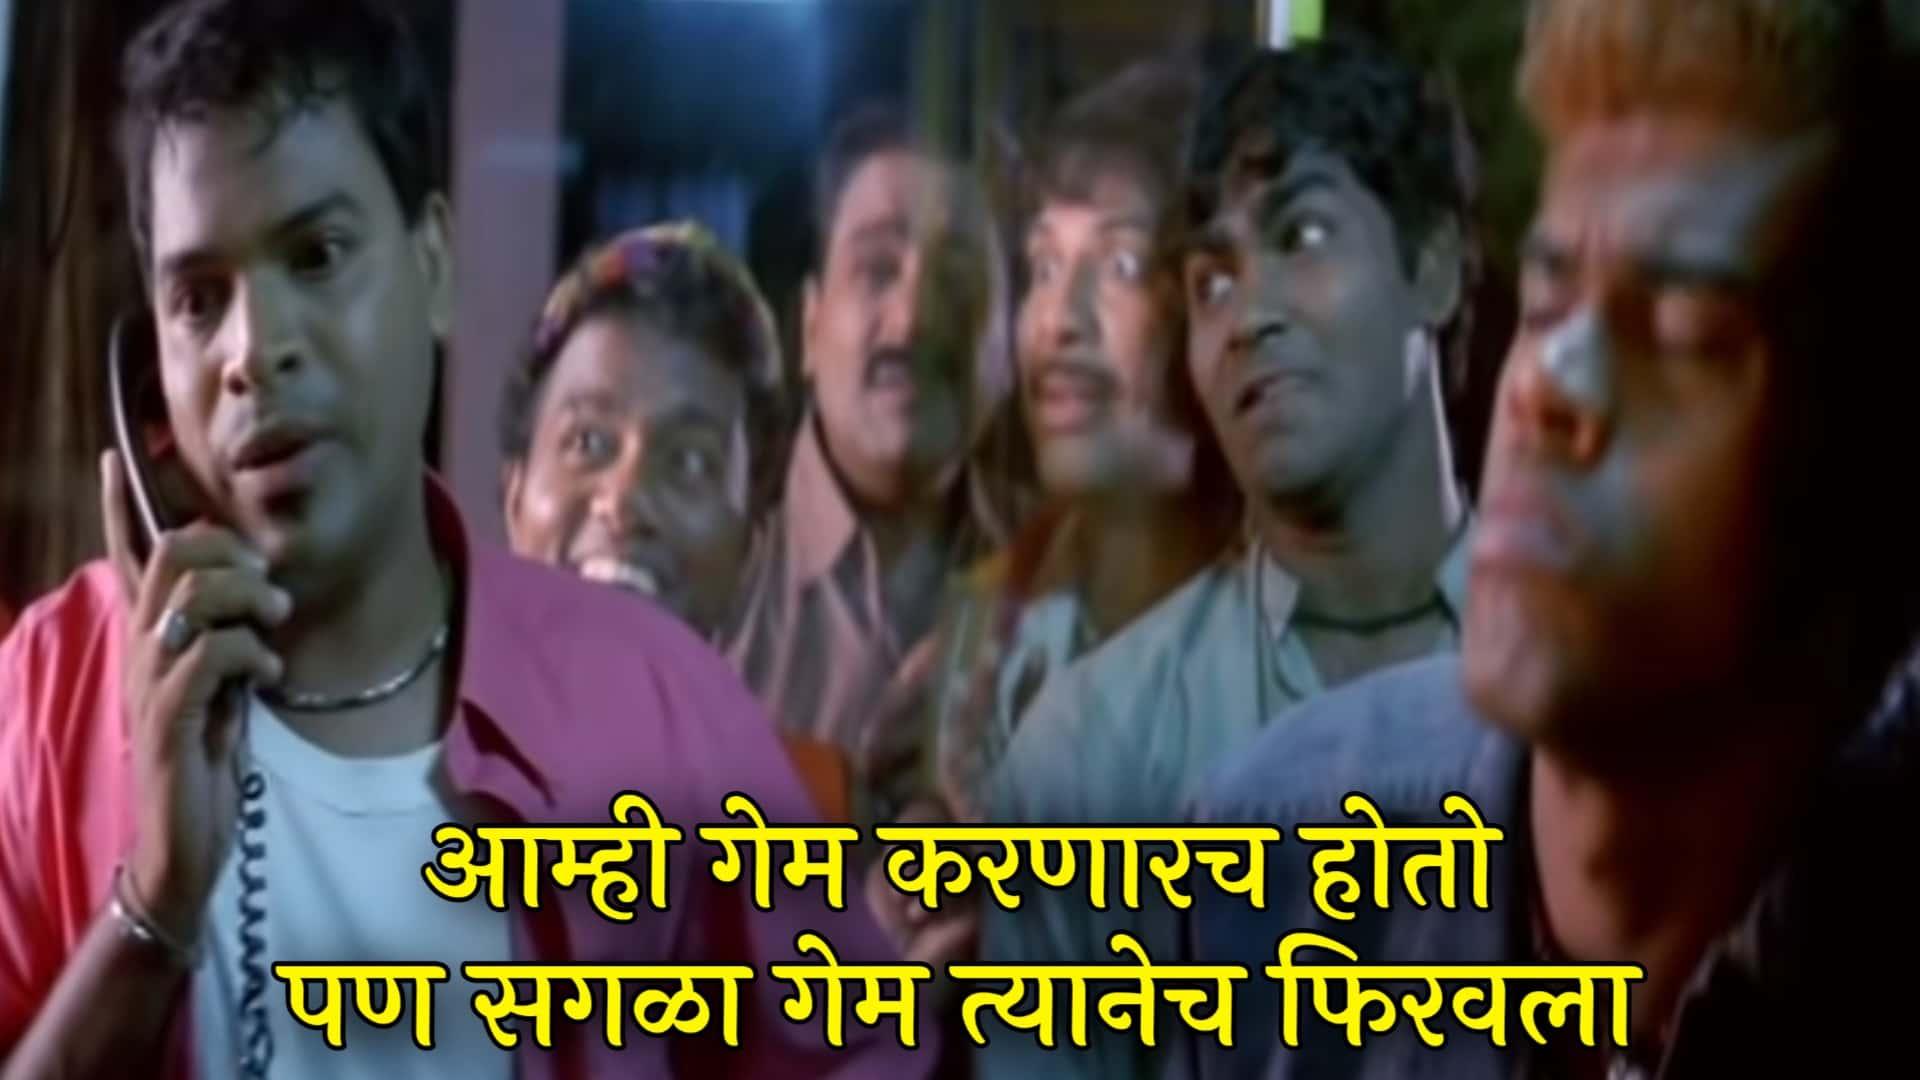 Jatra Hyalagaad Re Tyalagaad Movie Dialogues Meme Templates Bharatiya Vishwa Images tagged yay or nay. hyalagaad re tyalagaad movie dialogues